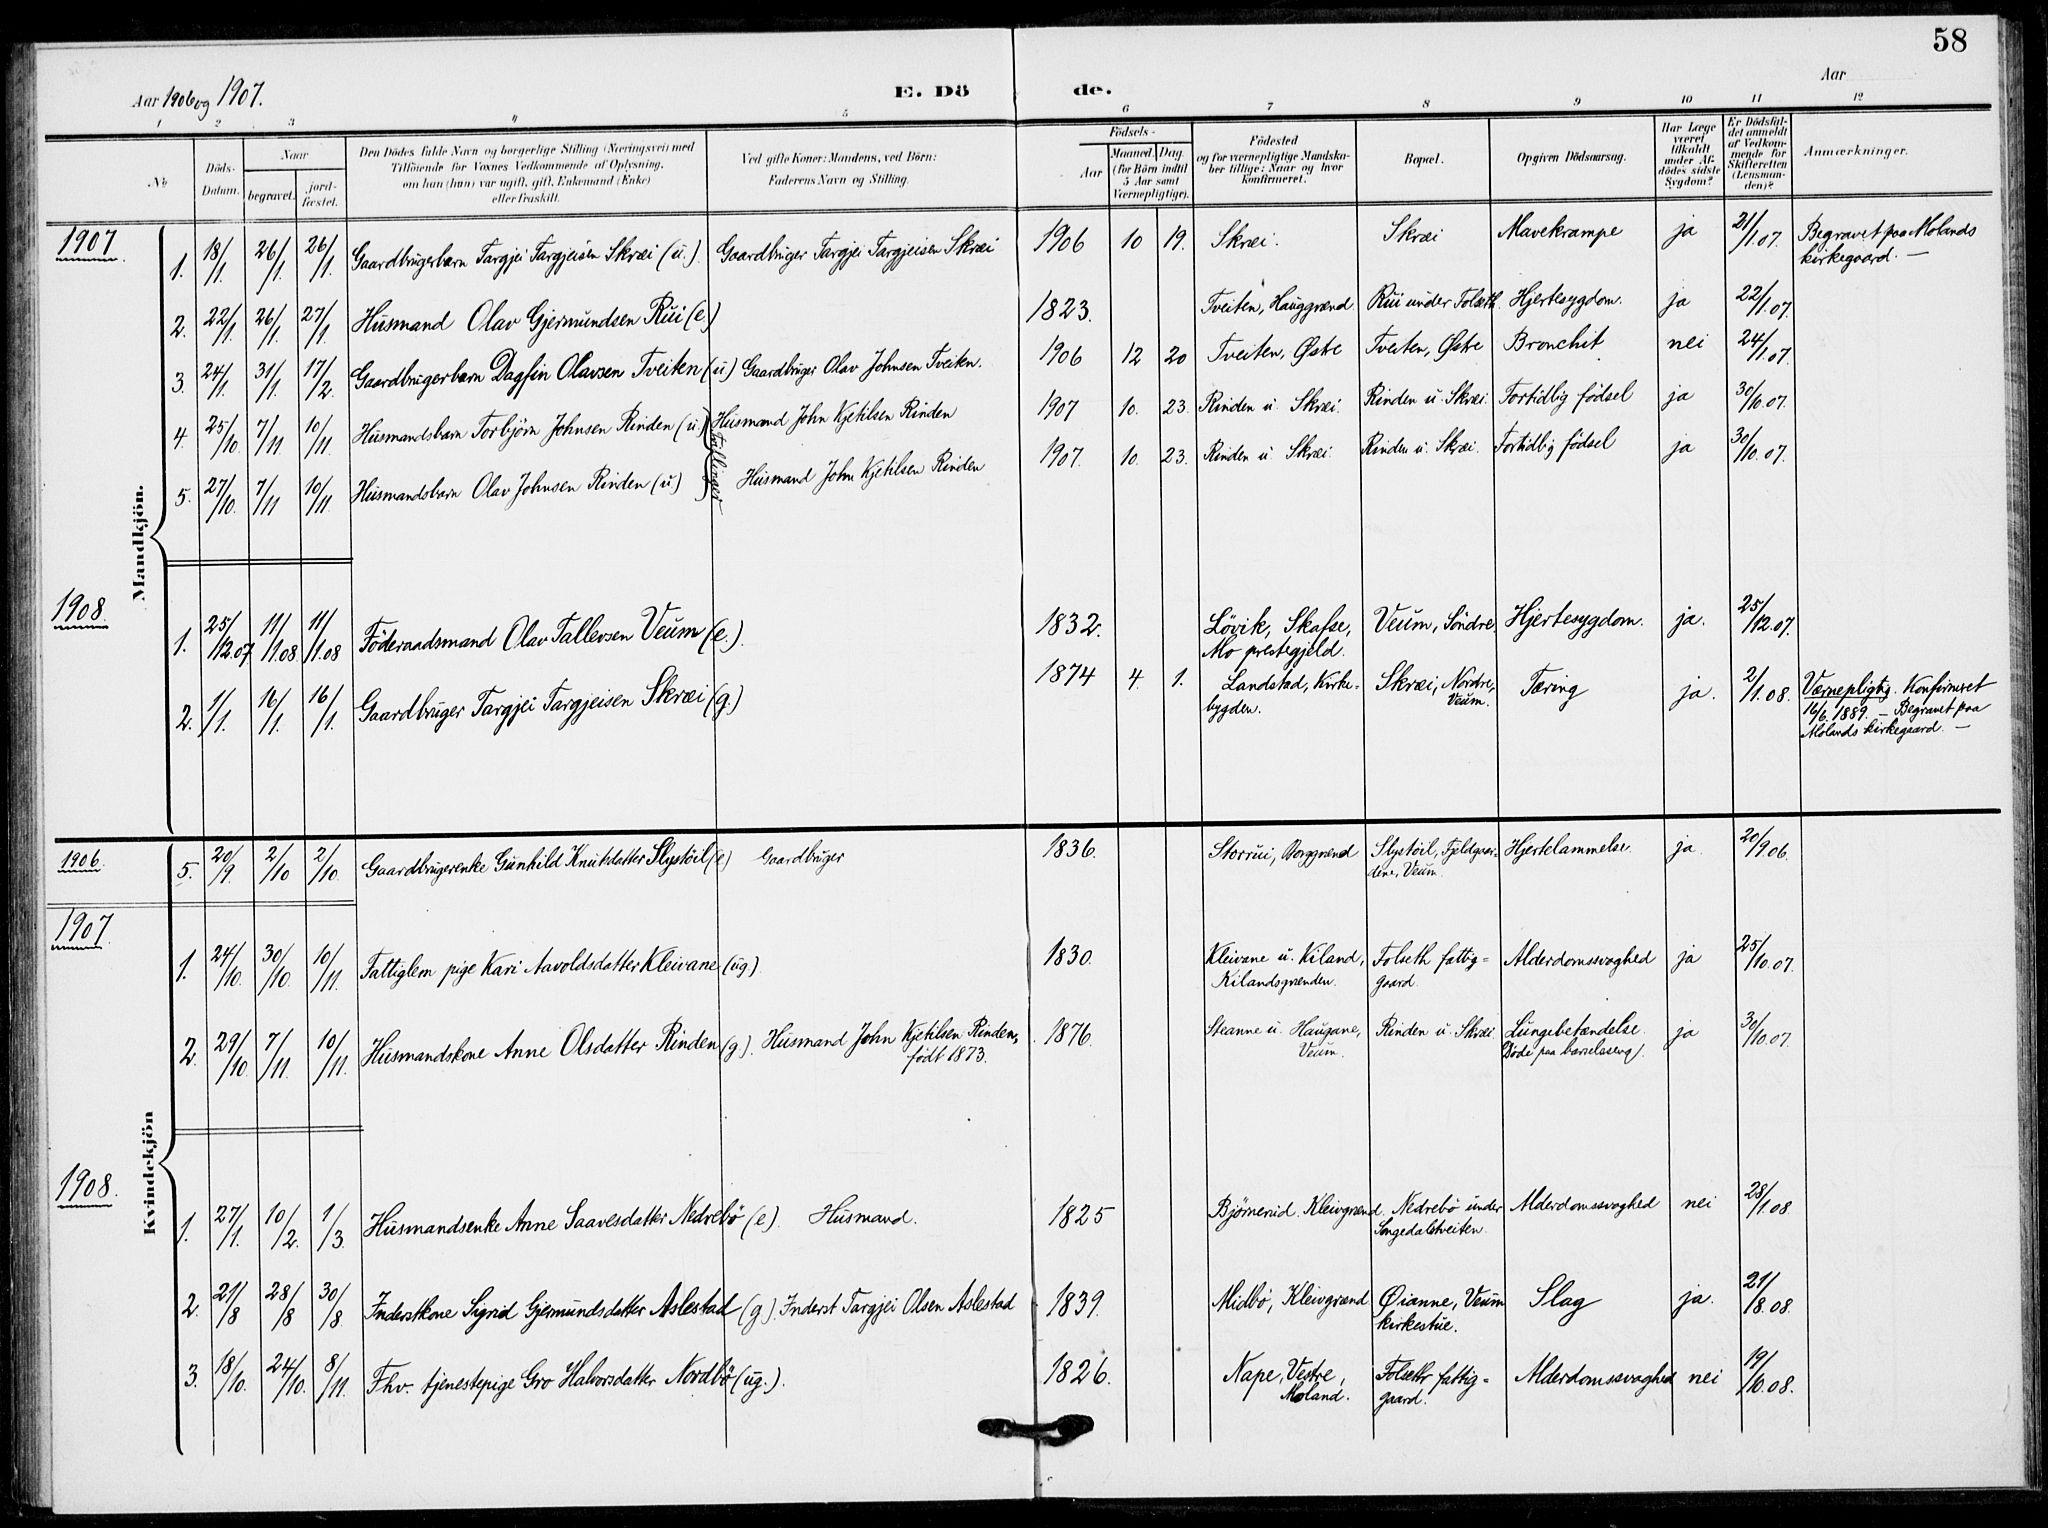 SAKO, Fyresdal kirkebøker, F/Fb/L0004: Ministerialbok nr. II 4, 1903-1920, s. 58